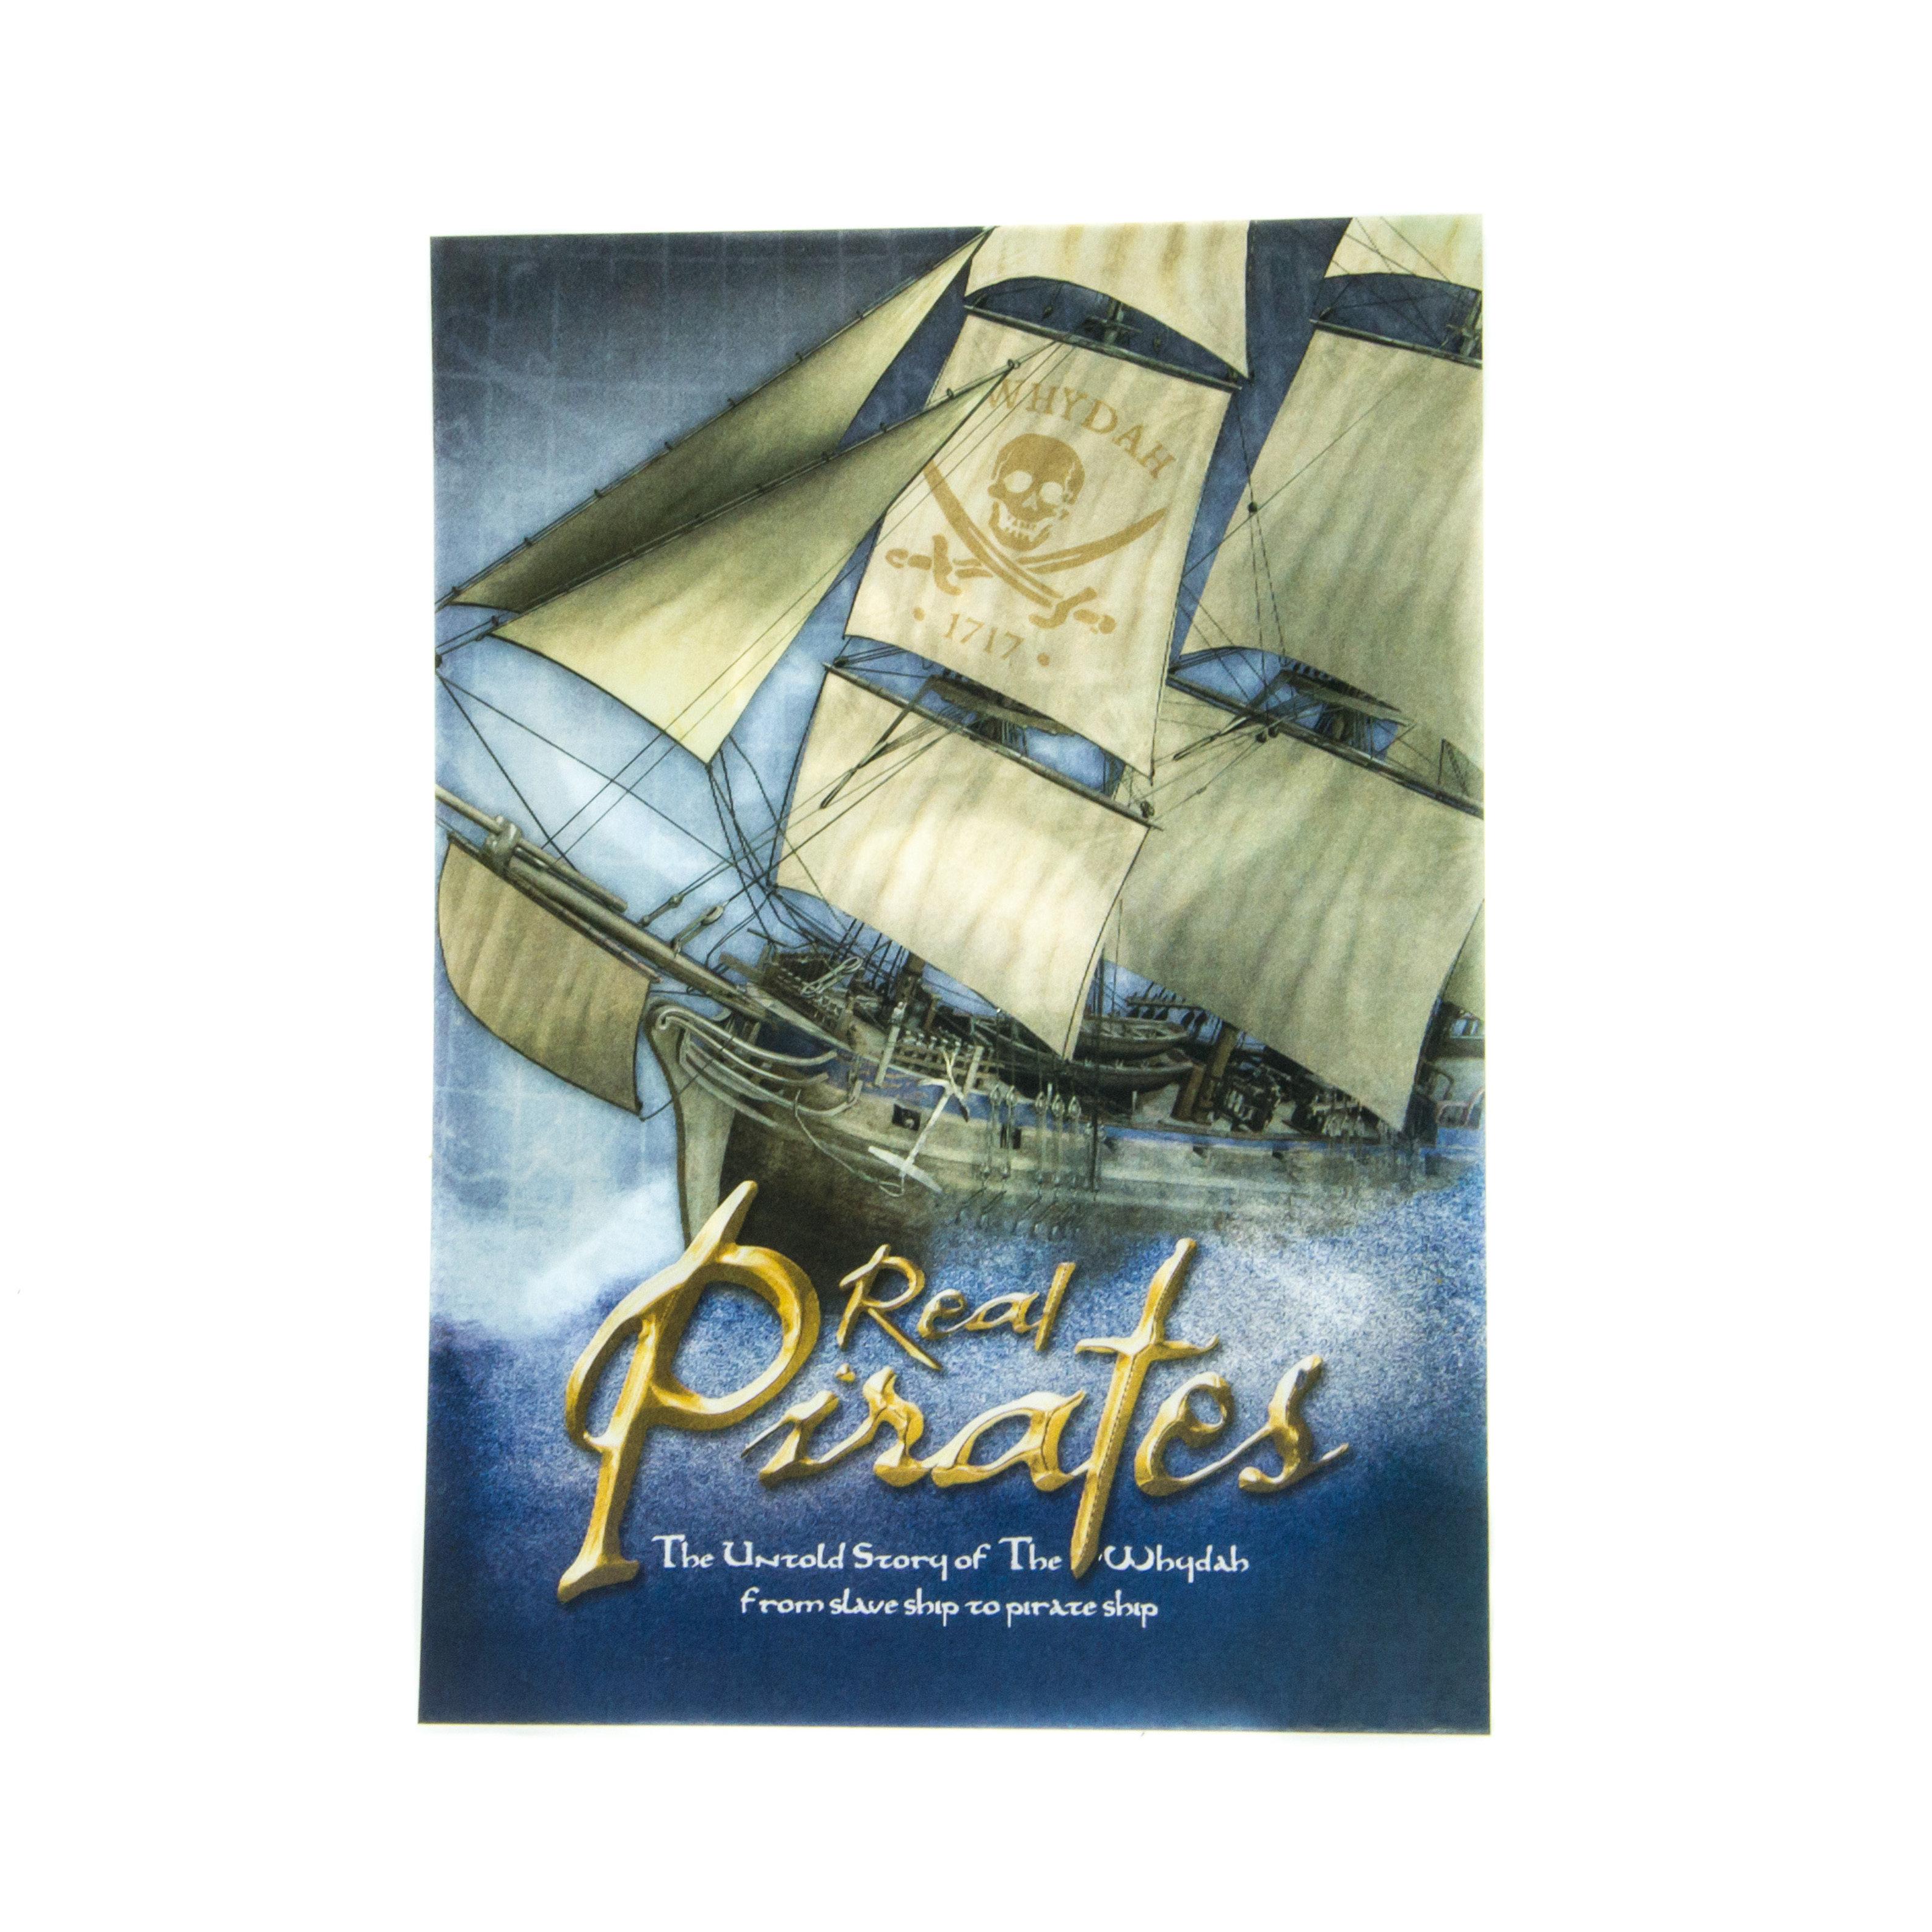 Real Pirates Lenticular Postcard M7ZVKNXET4PH6